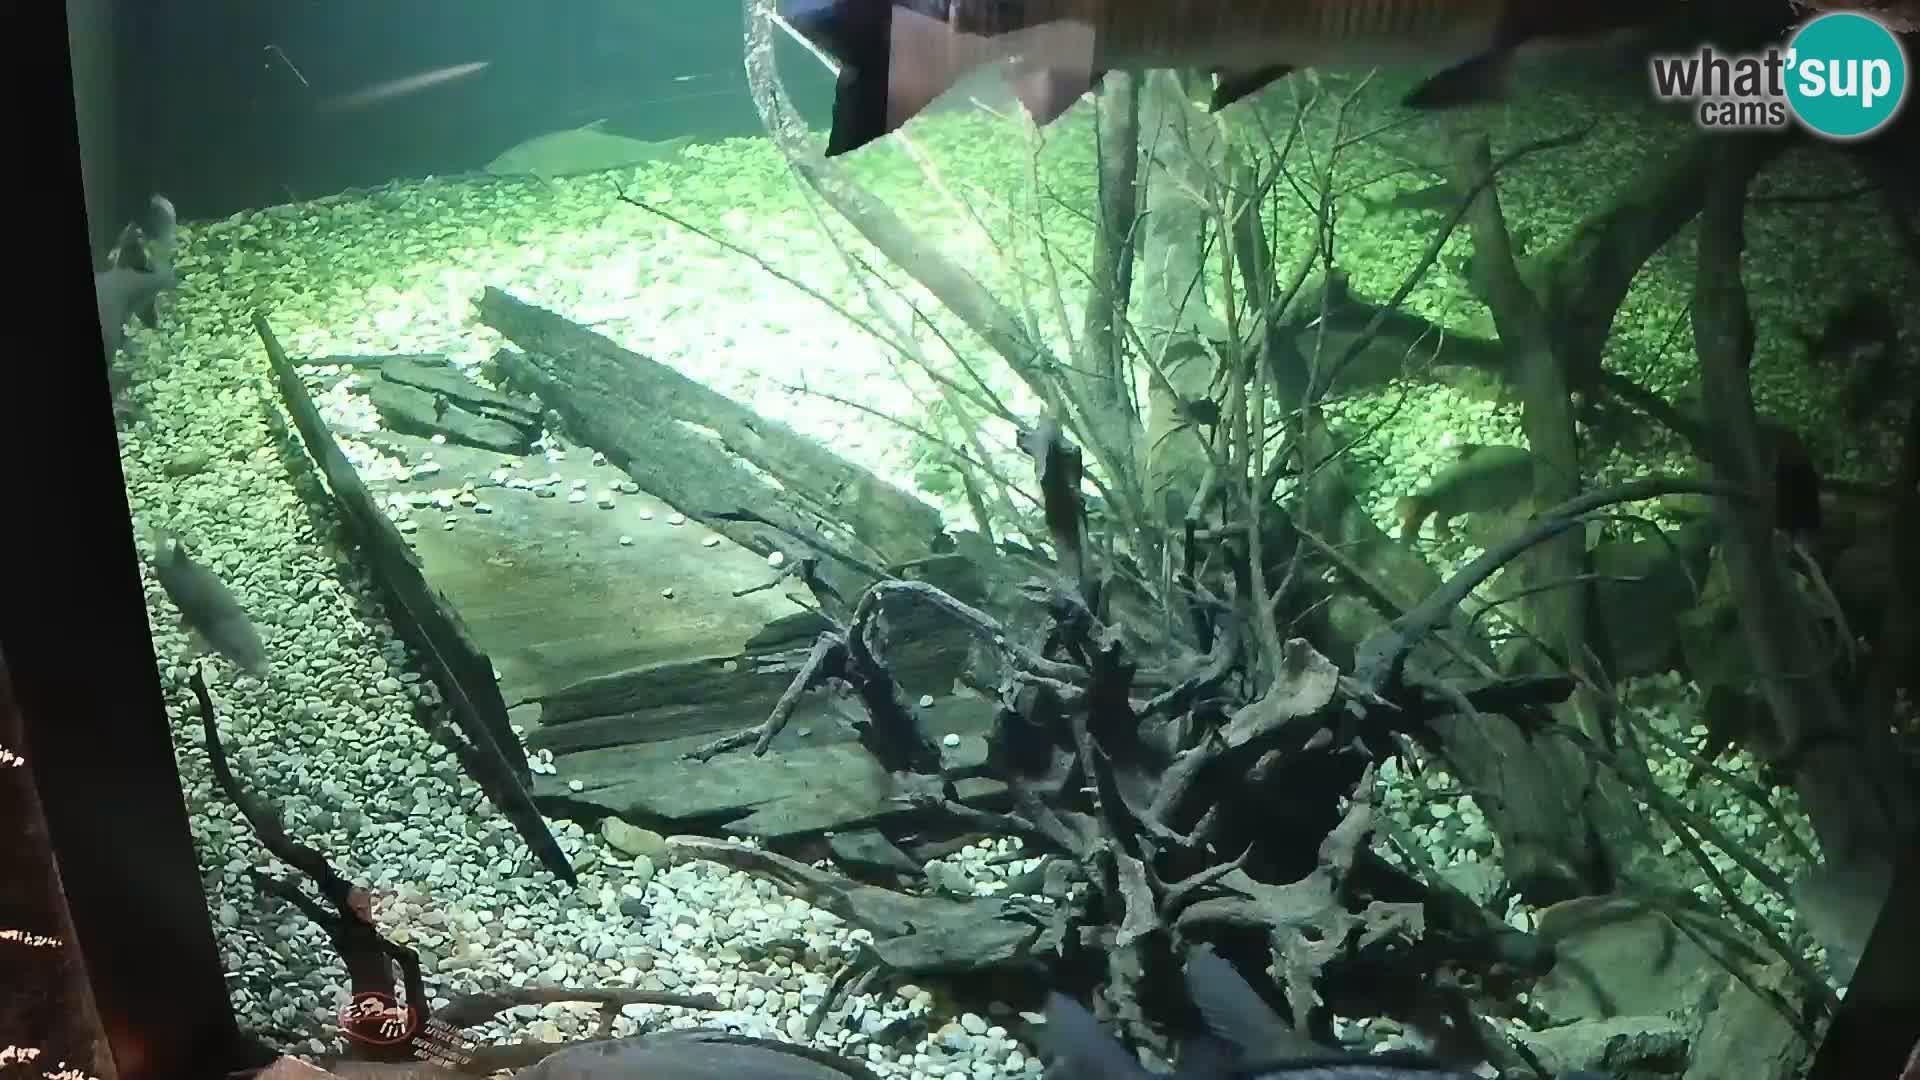 AQUATIKA Karlovac – Live webcam Aquario d'acqua dolce